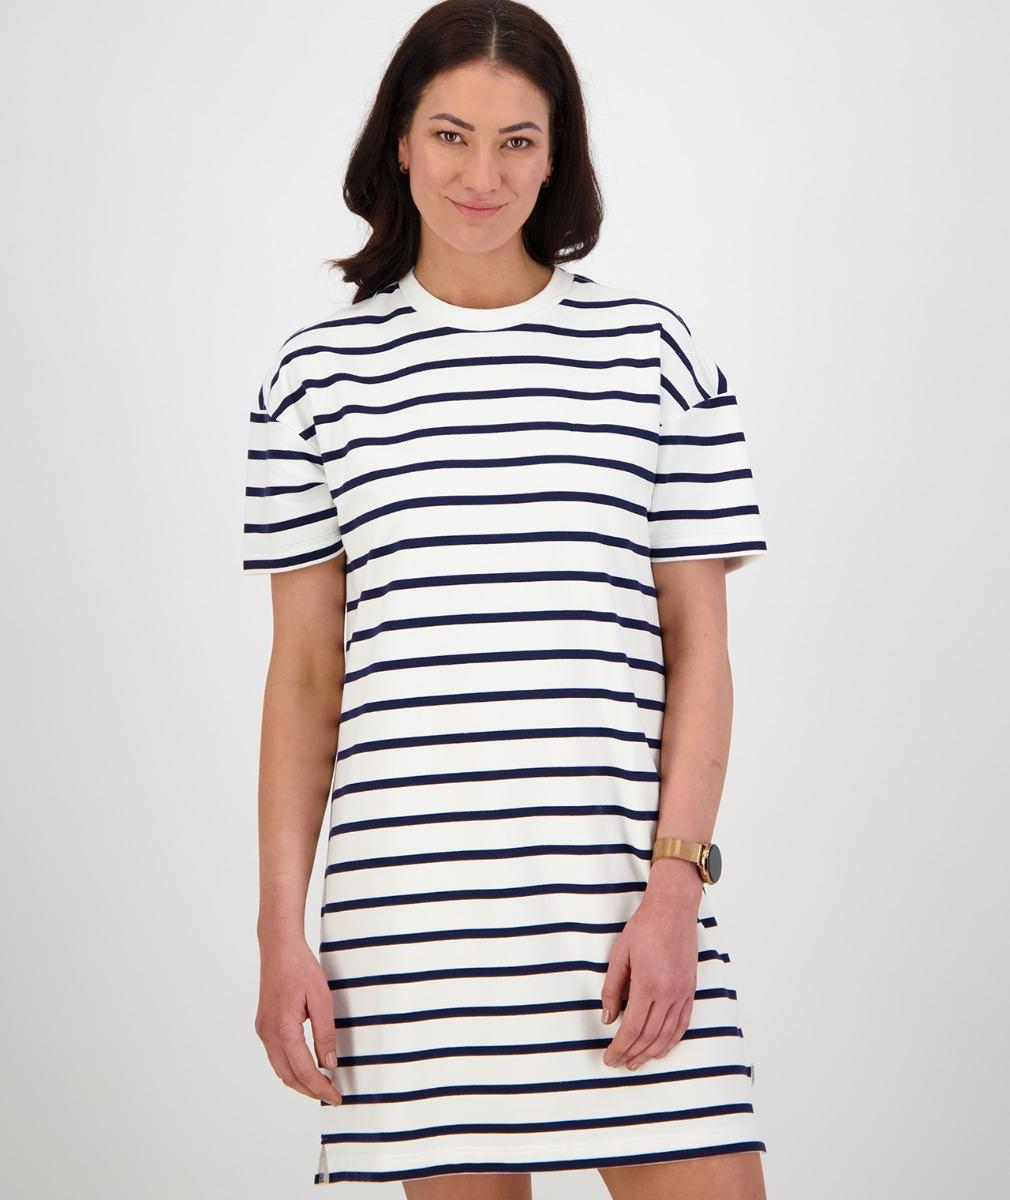 Swanndri Women's Acacia Stripe Dress in White/Navy